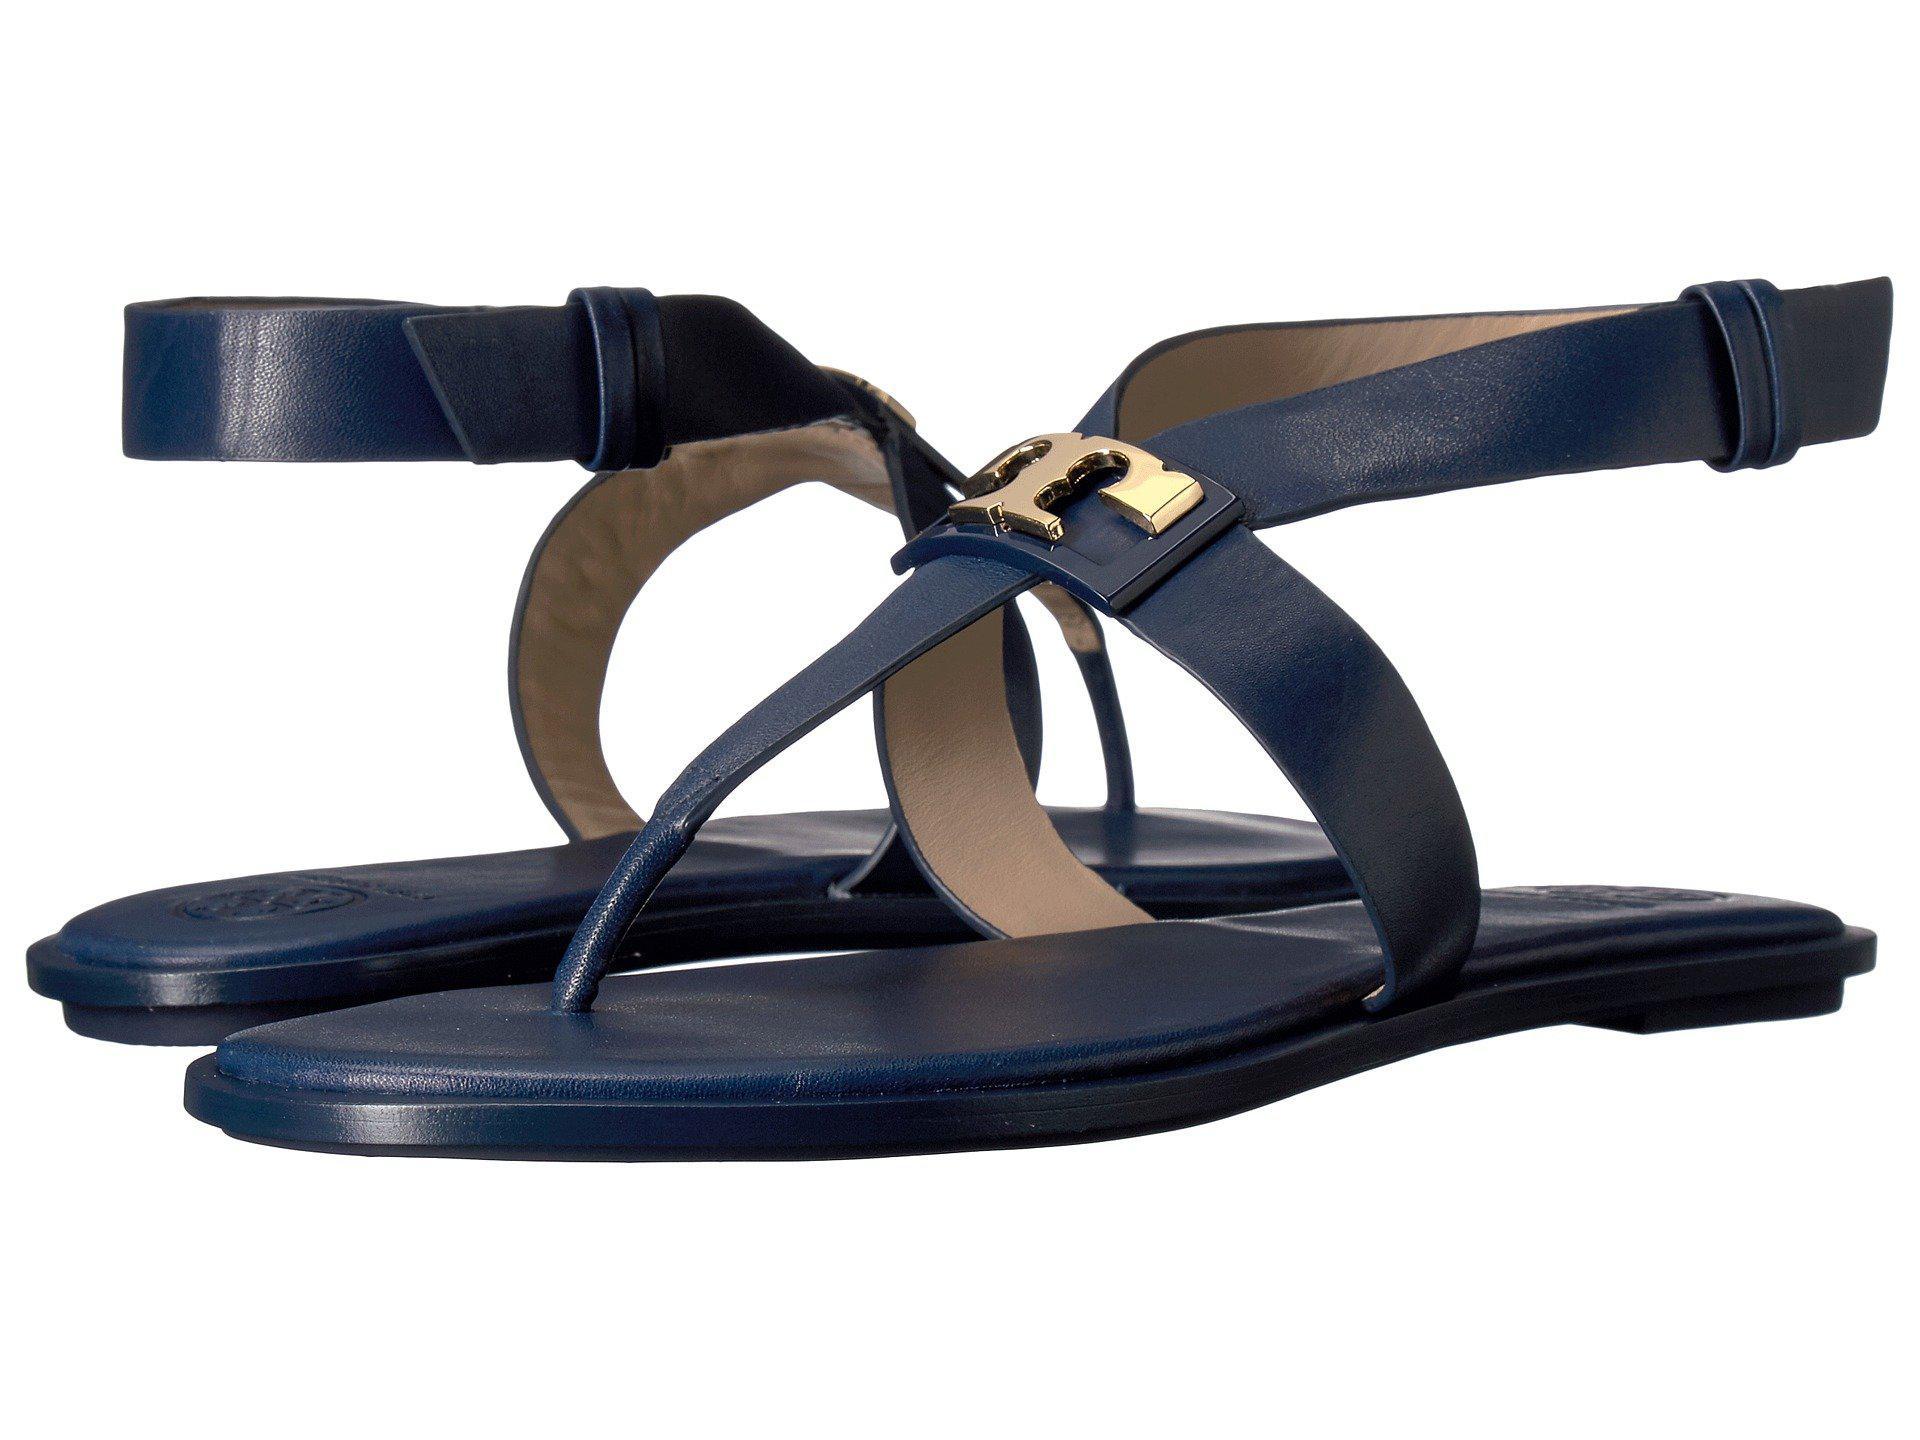 c37c737ba4e8f5 Lyst - Tory Burch Gigi Flat Sandal in Blue